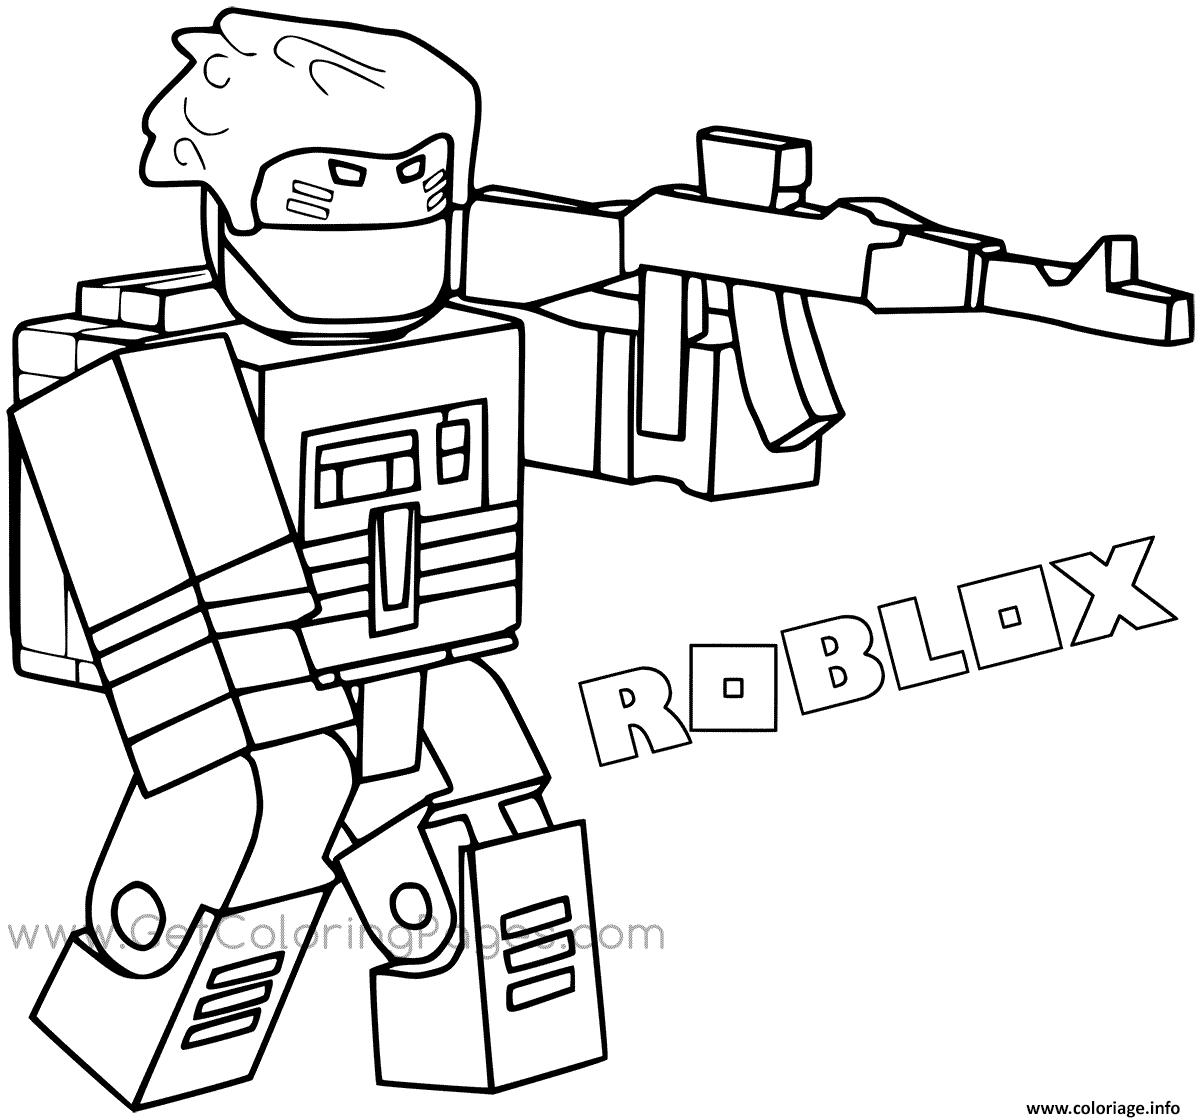 Dessin Roblox Bandit with Weapon and Backpac Coloriage Gratuit à Imprimer